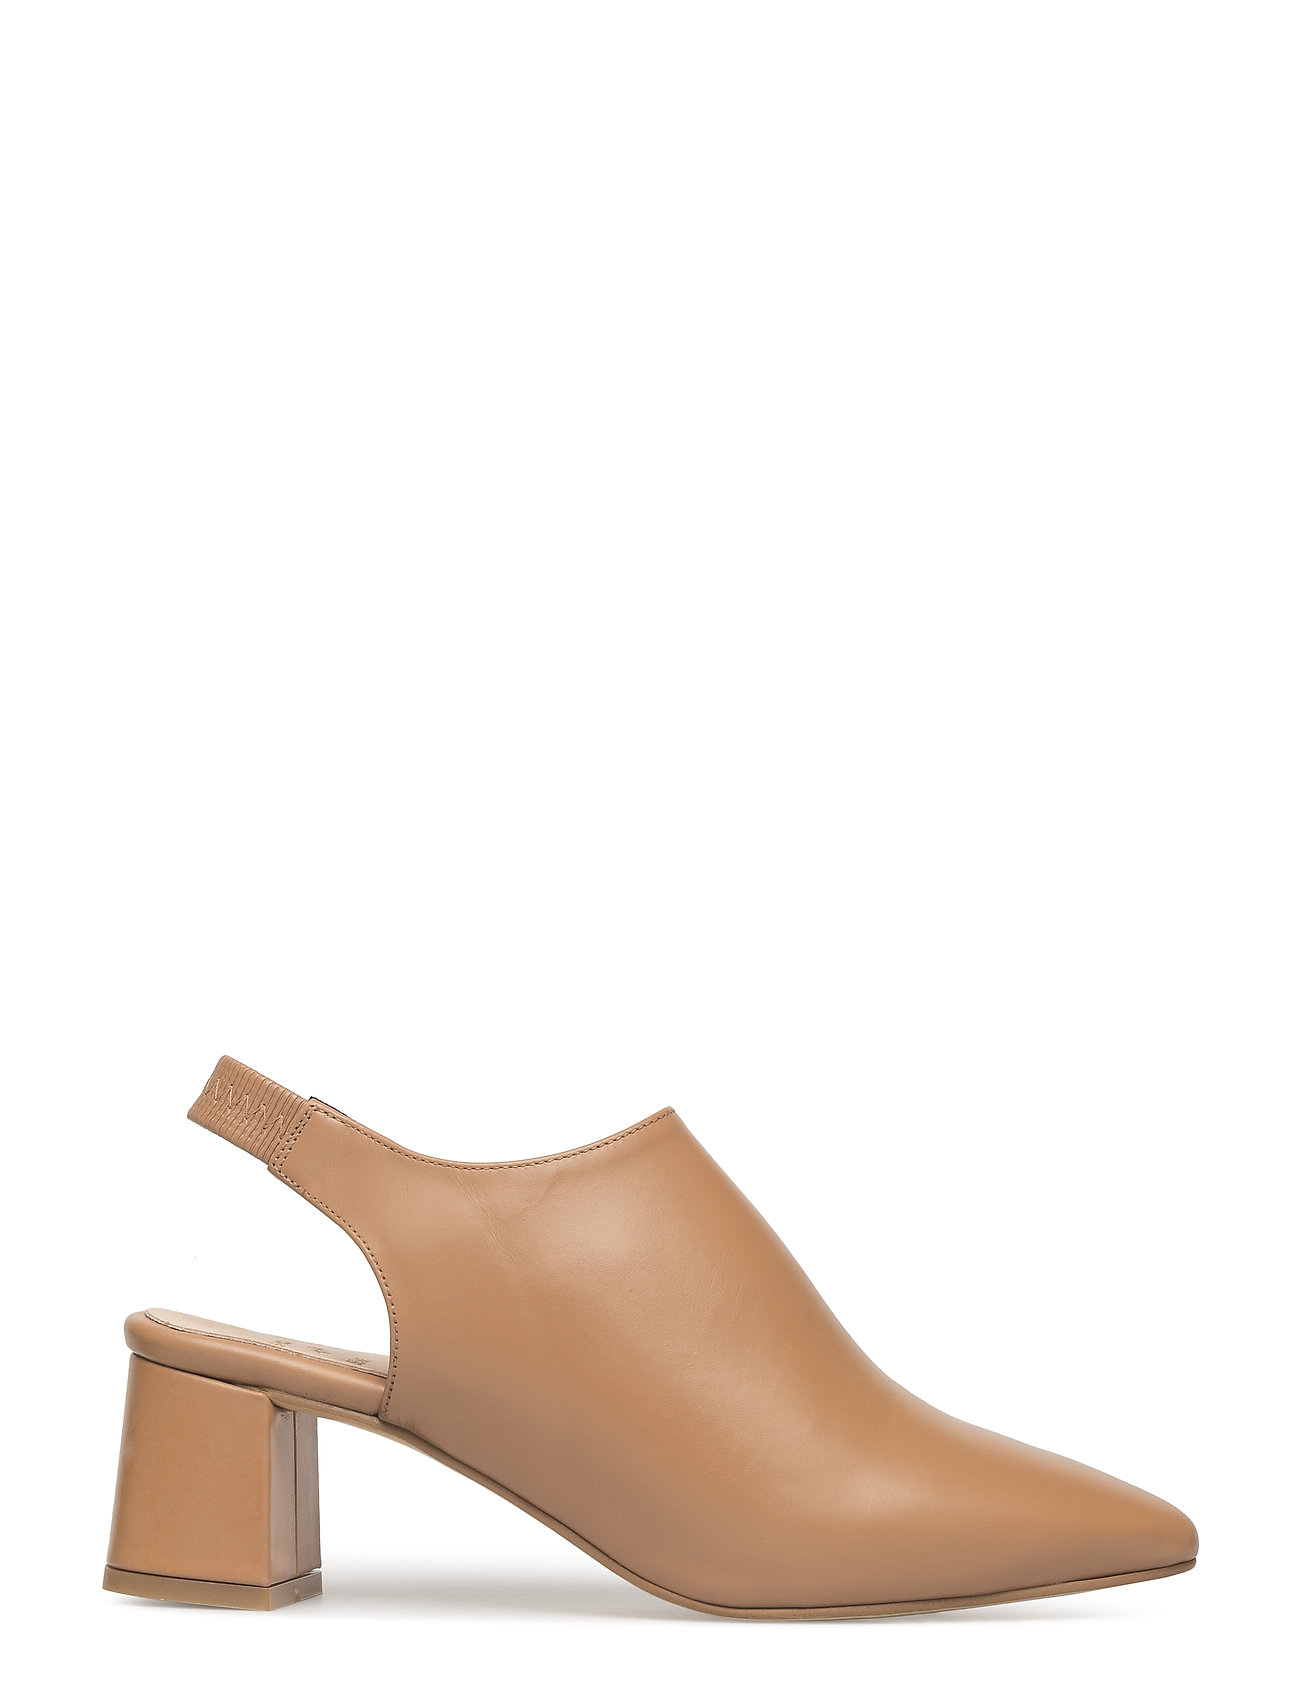 Allison Slingback L Shoes Heels Pumps Sling Backs Brun Shoe The Bear